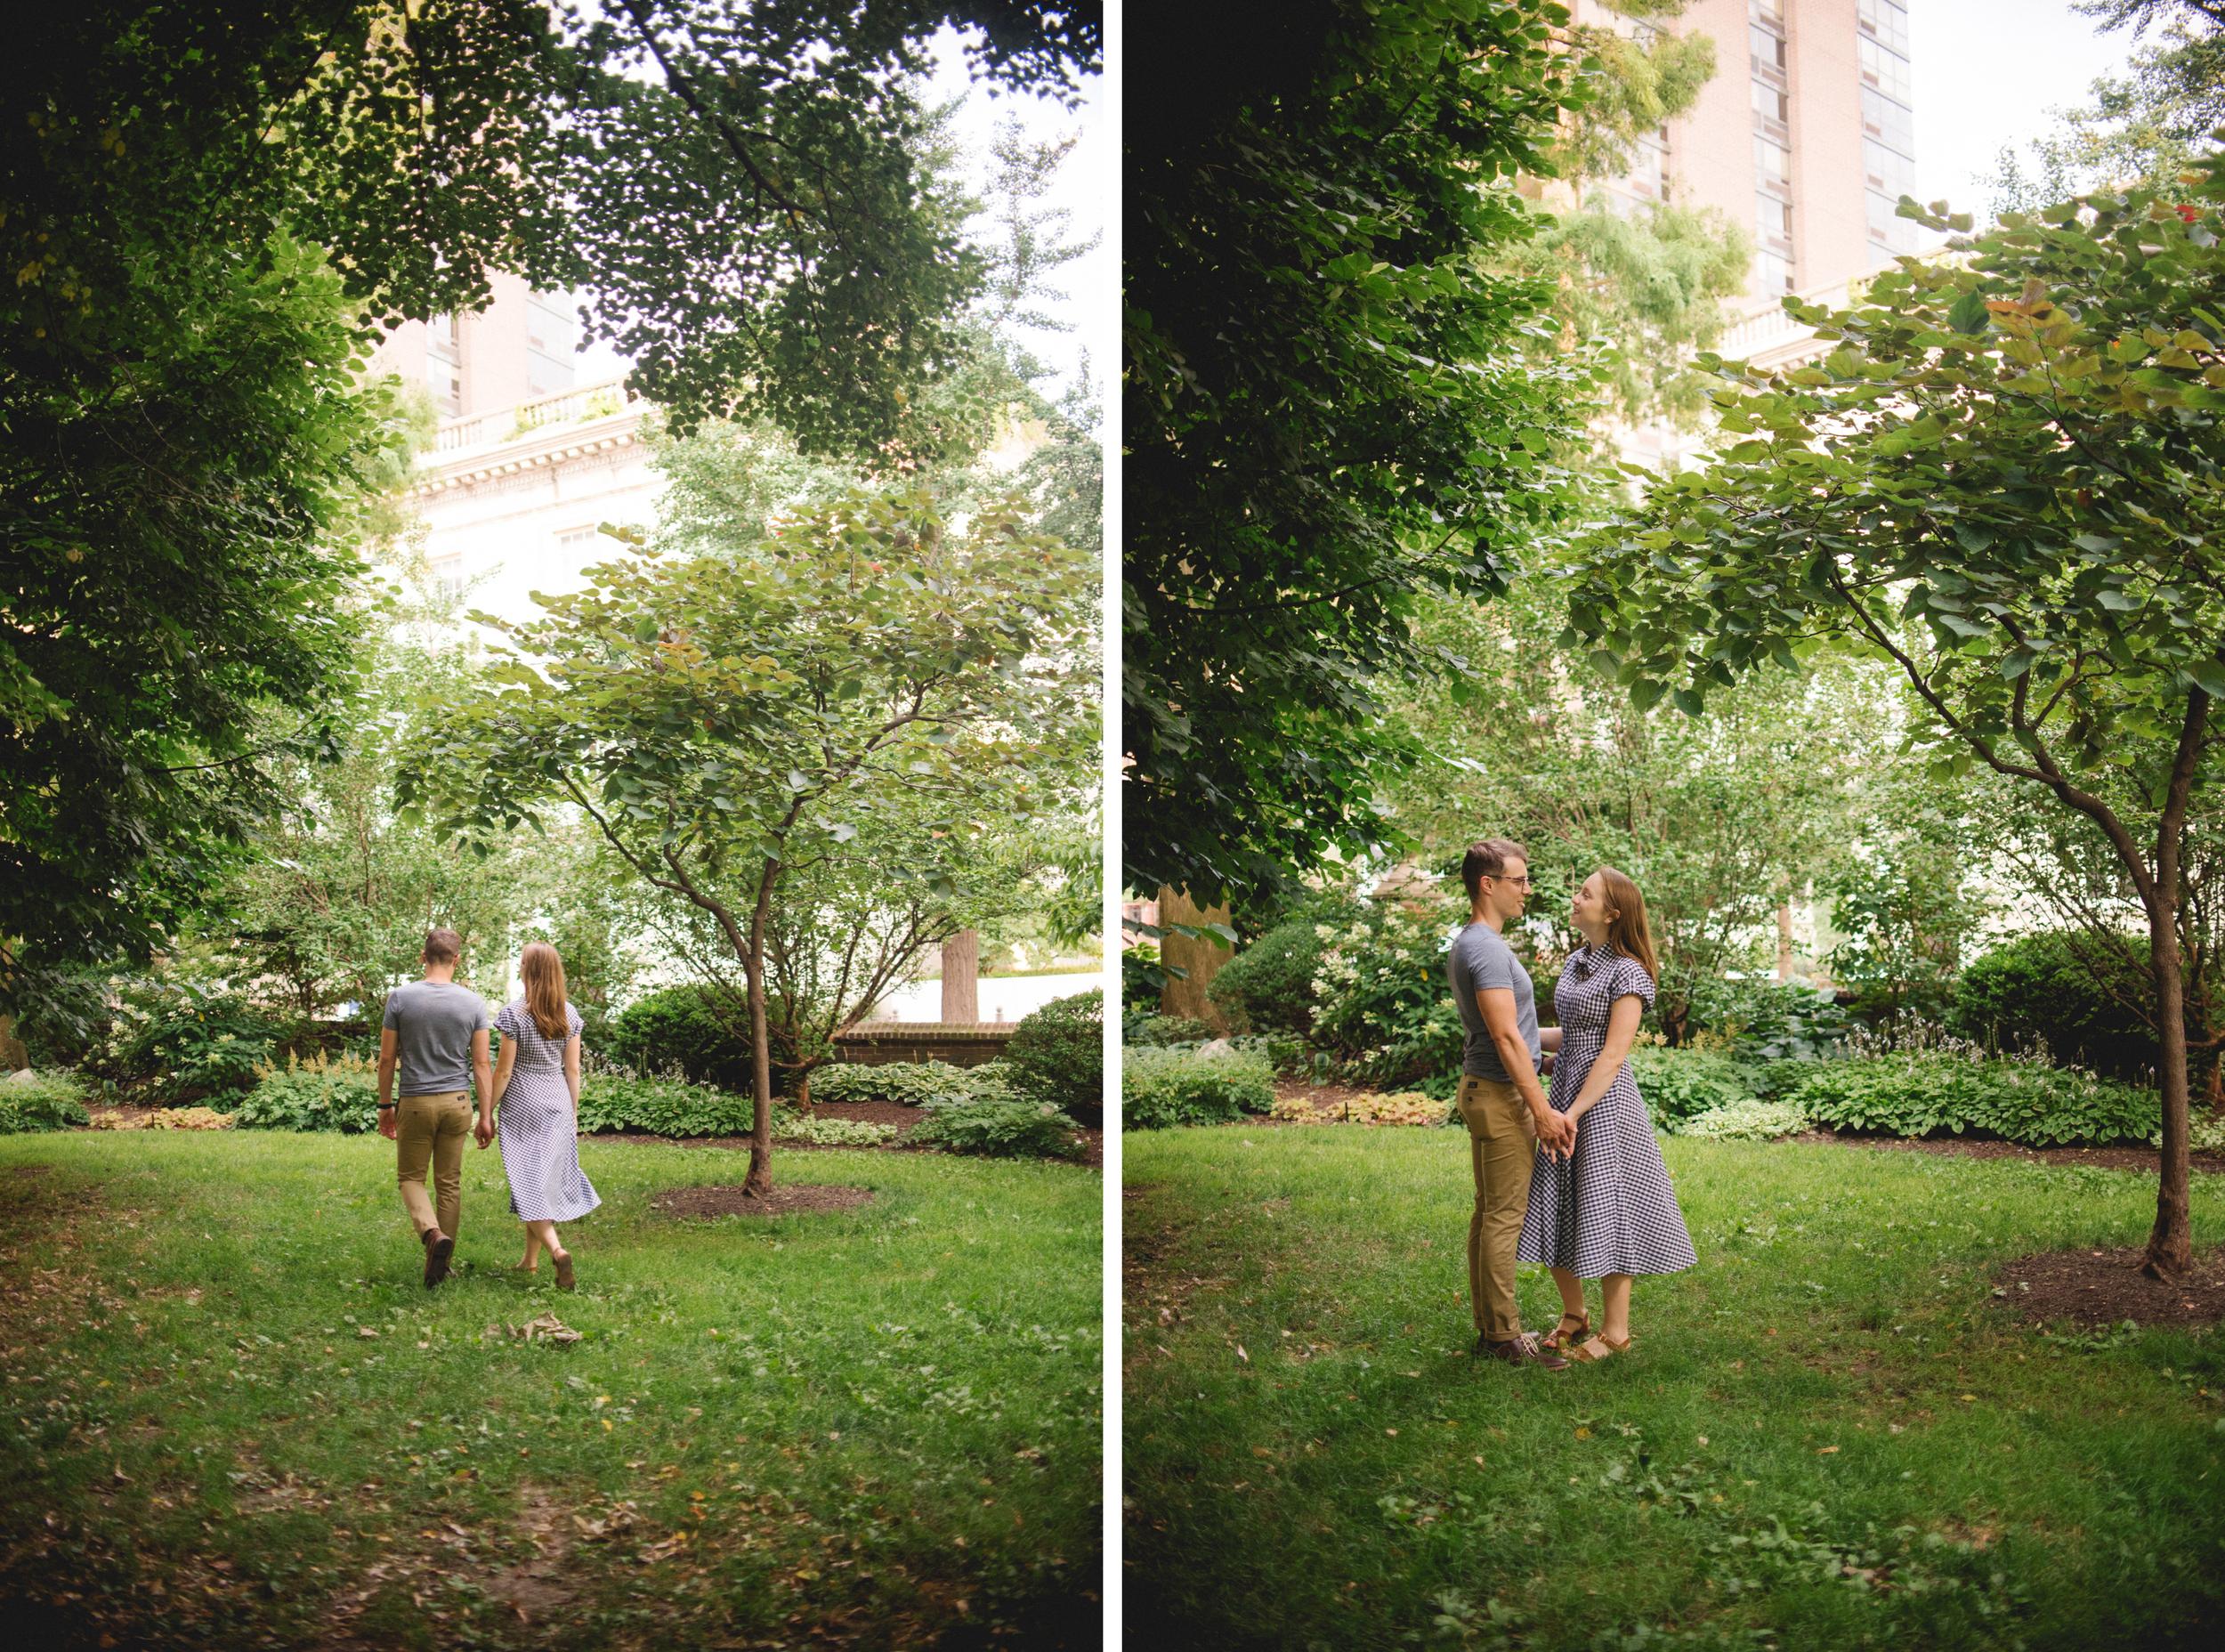 Peaberry-Photography-Society-Hill-Philadelphia-Pennsylvania-Newlyweds-Just-Married-044.jpg